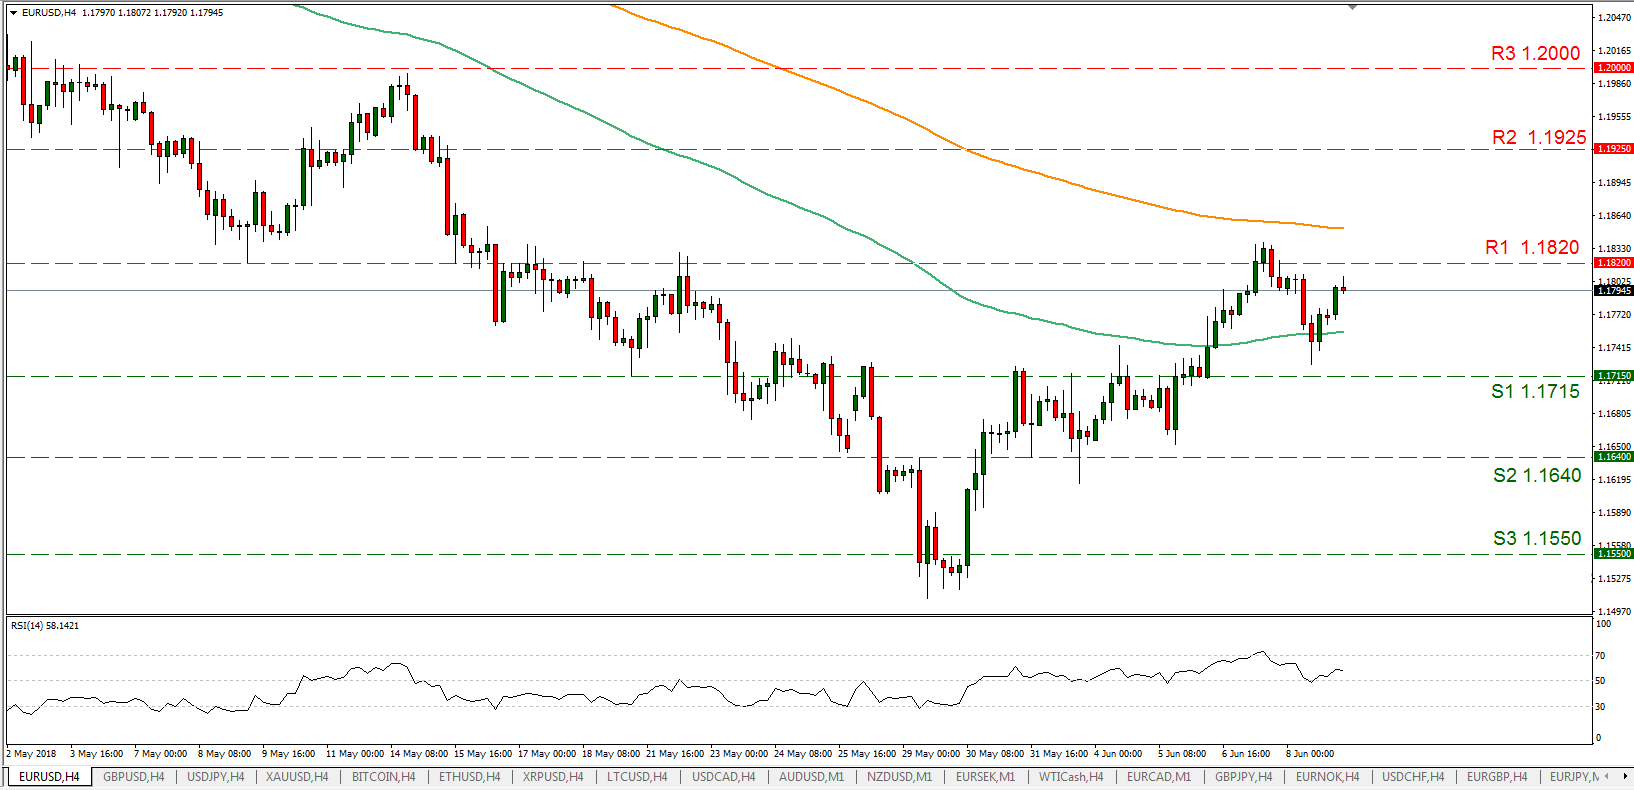 EUR/USD 11/06/2018 | EconAlerts